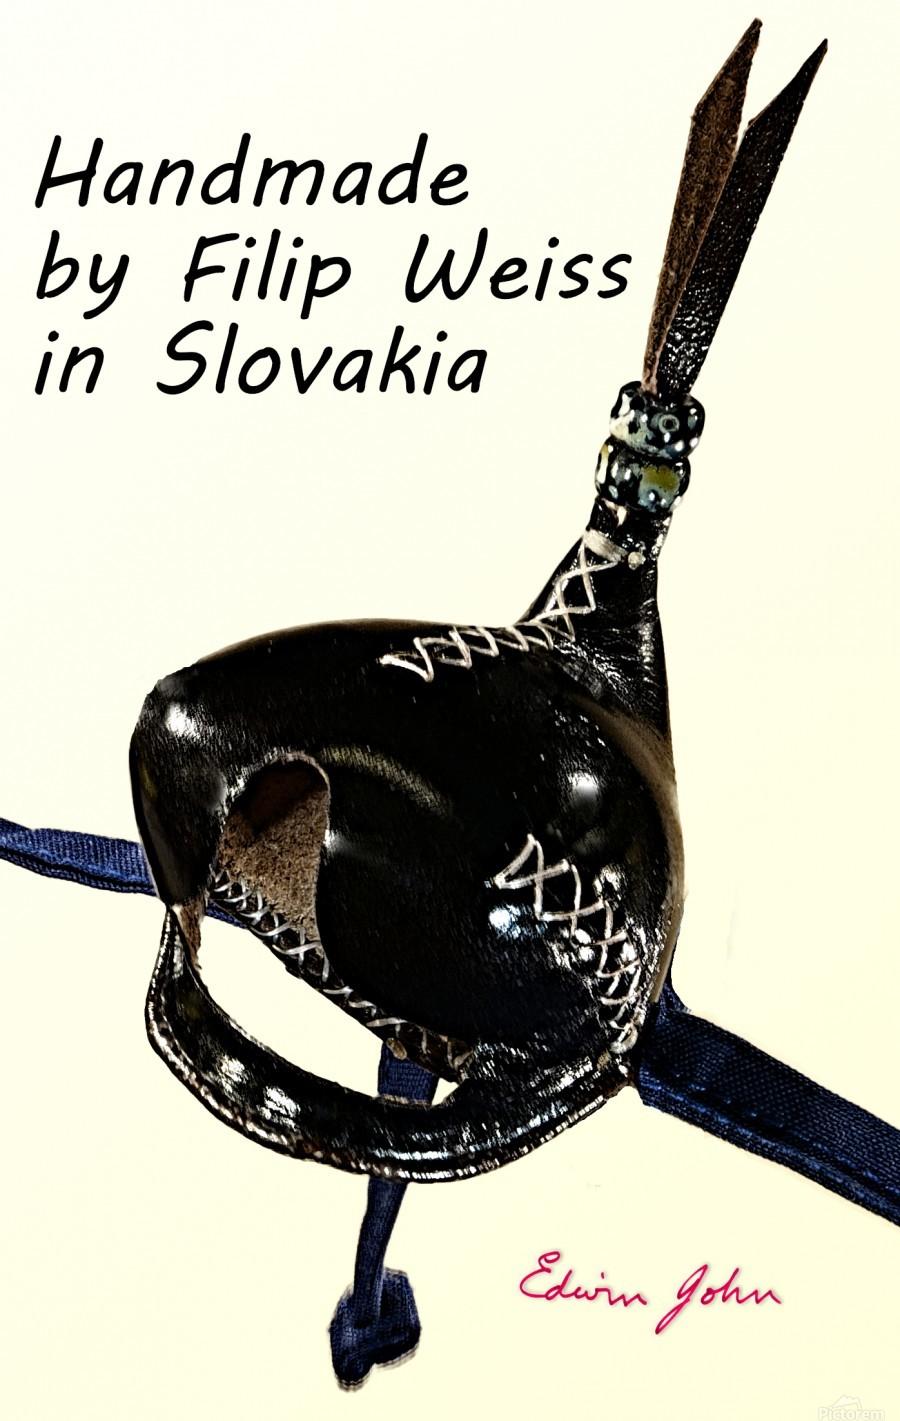 Black Leather Falcon hood Handmade in Slovakia by Filip  Print